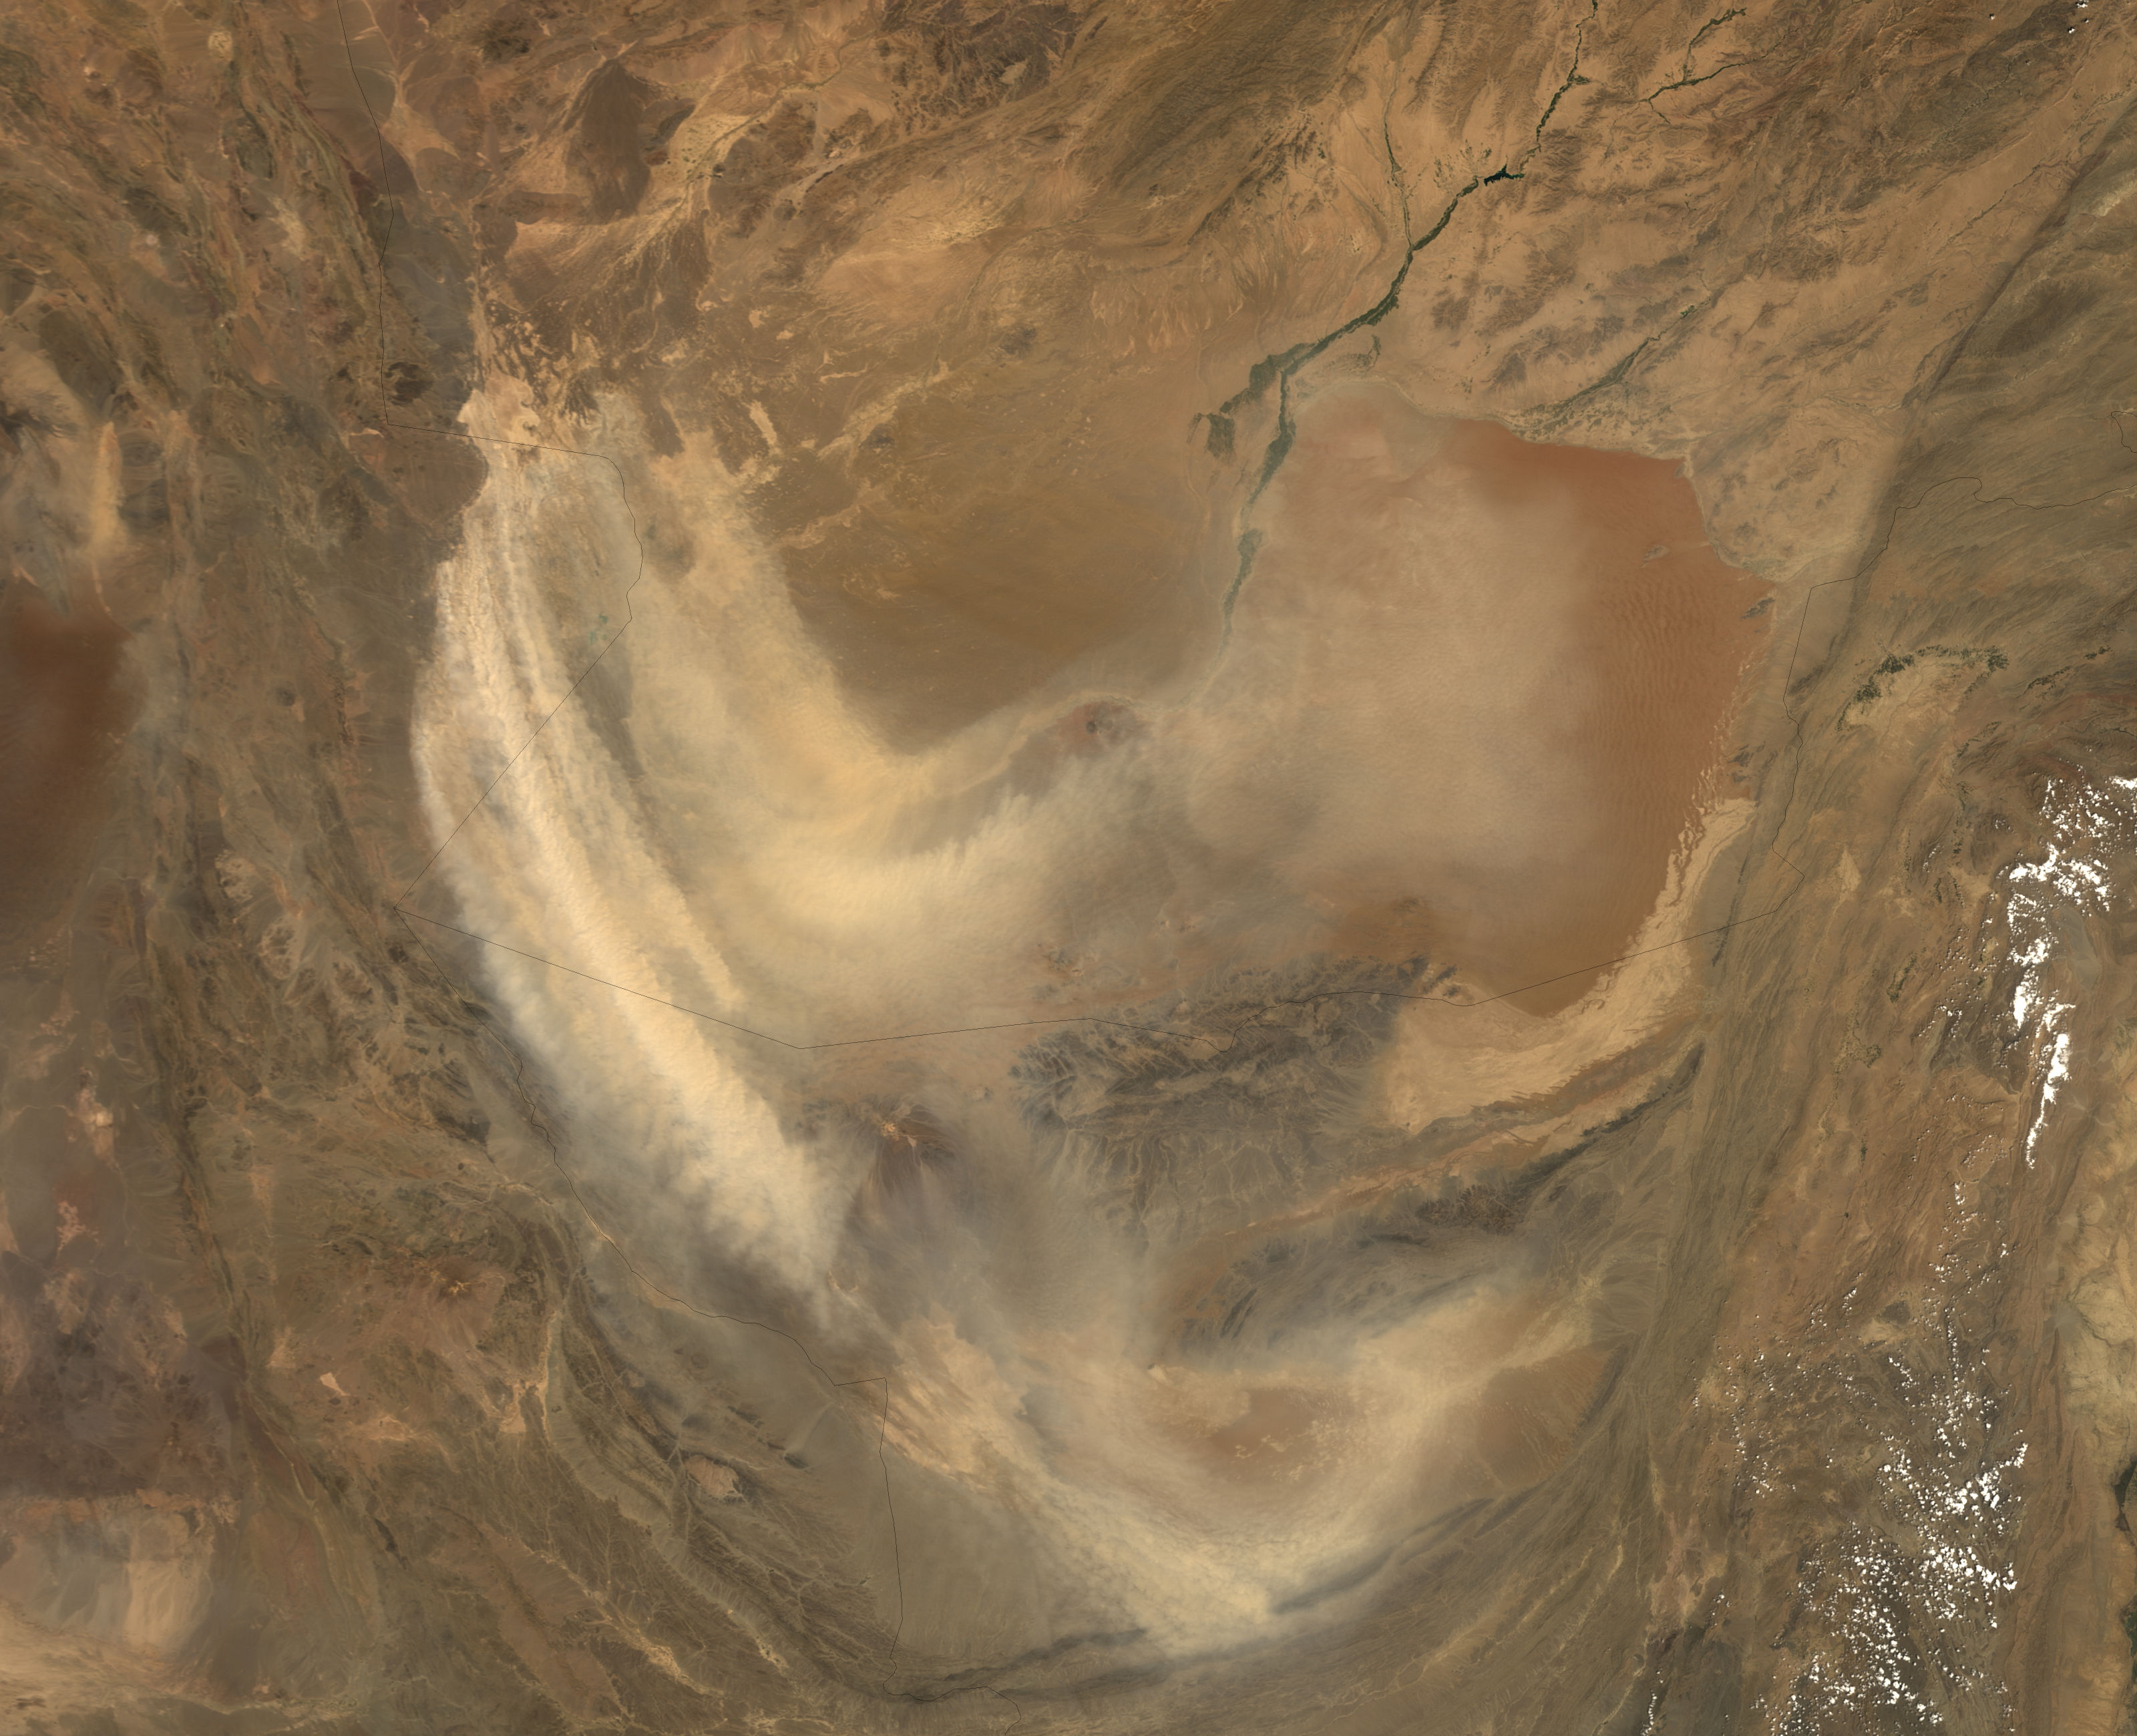 Tormenta de polvareda en Afganistán